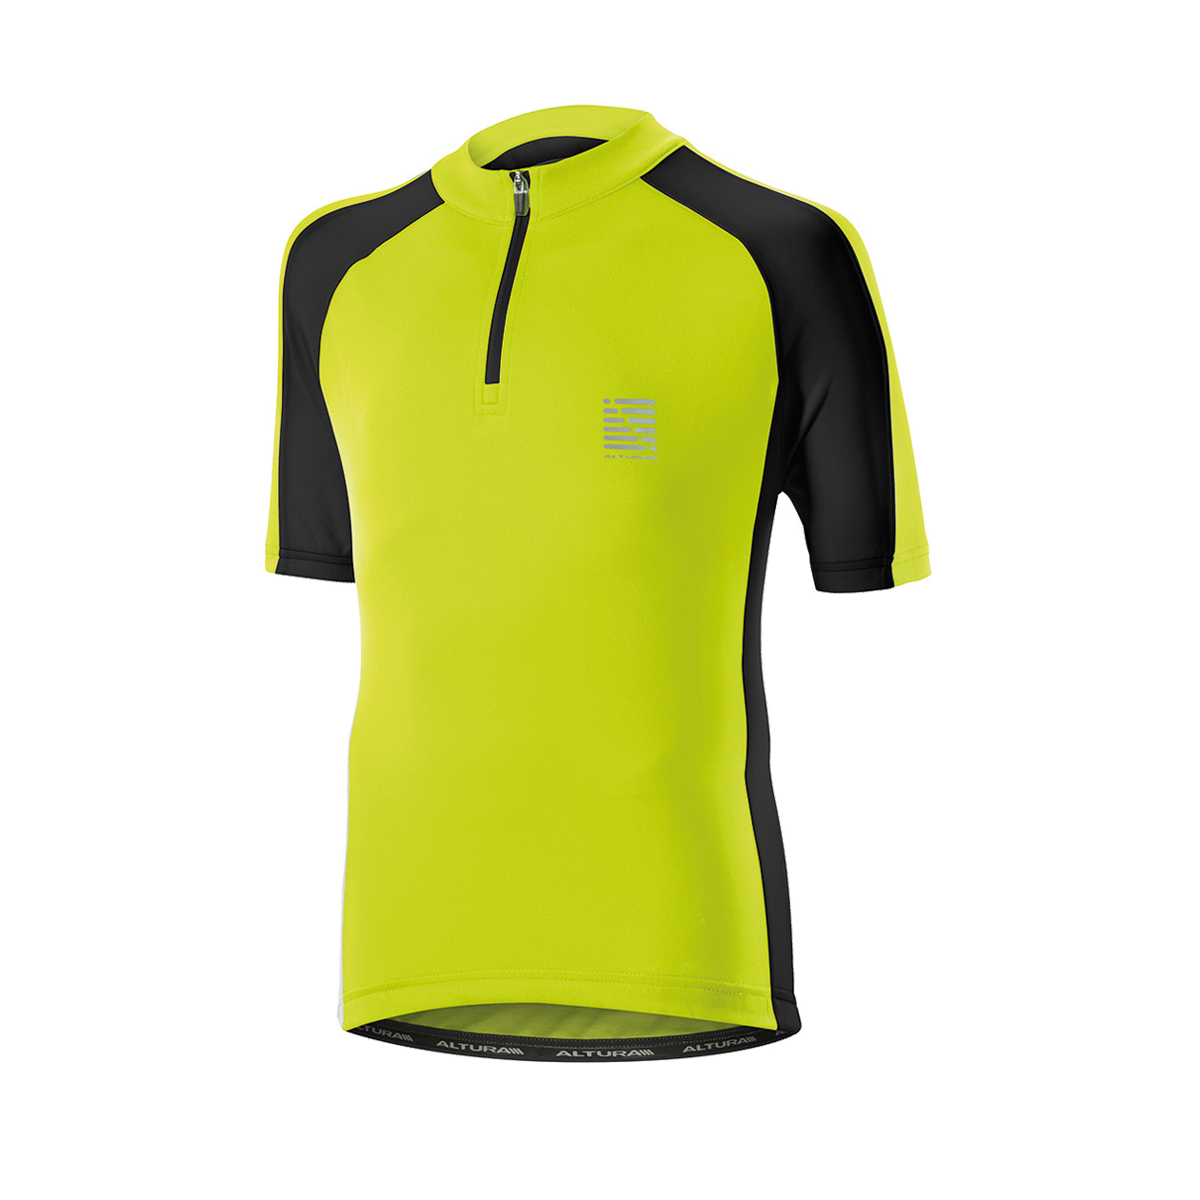 Altura Sprint Childrens Short Sleeve Jersey - 2017